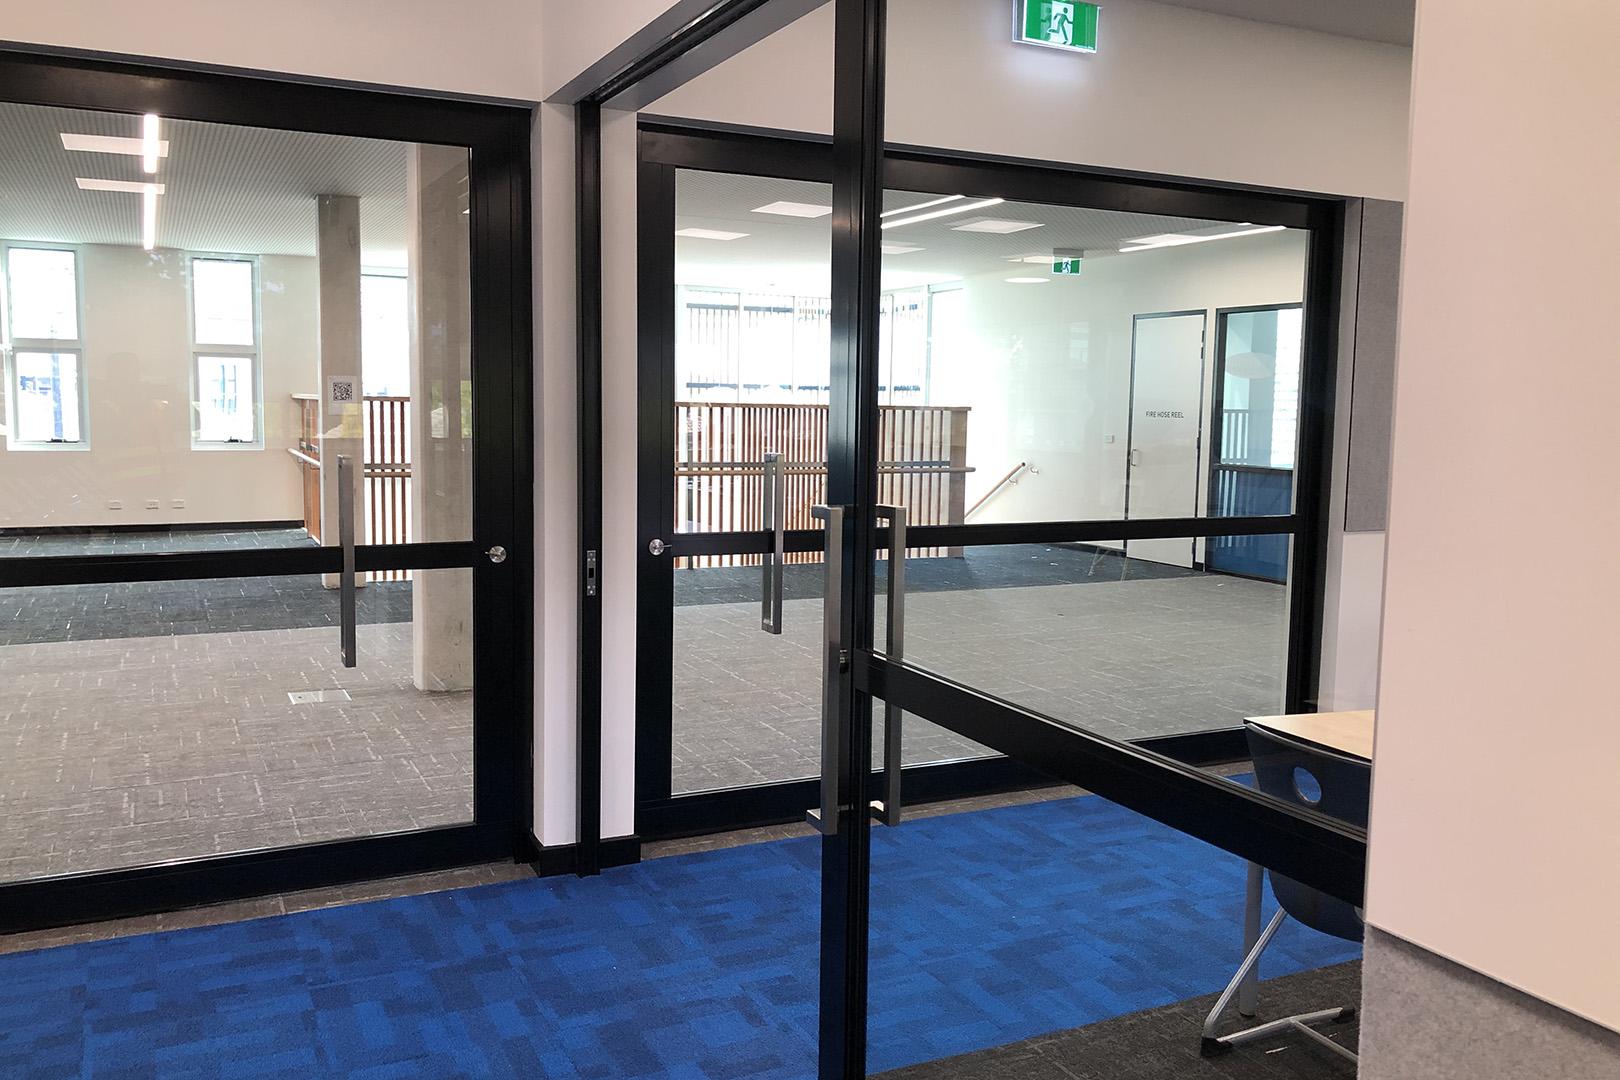 image of acoustic sliders inside a school